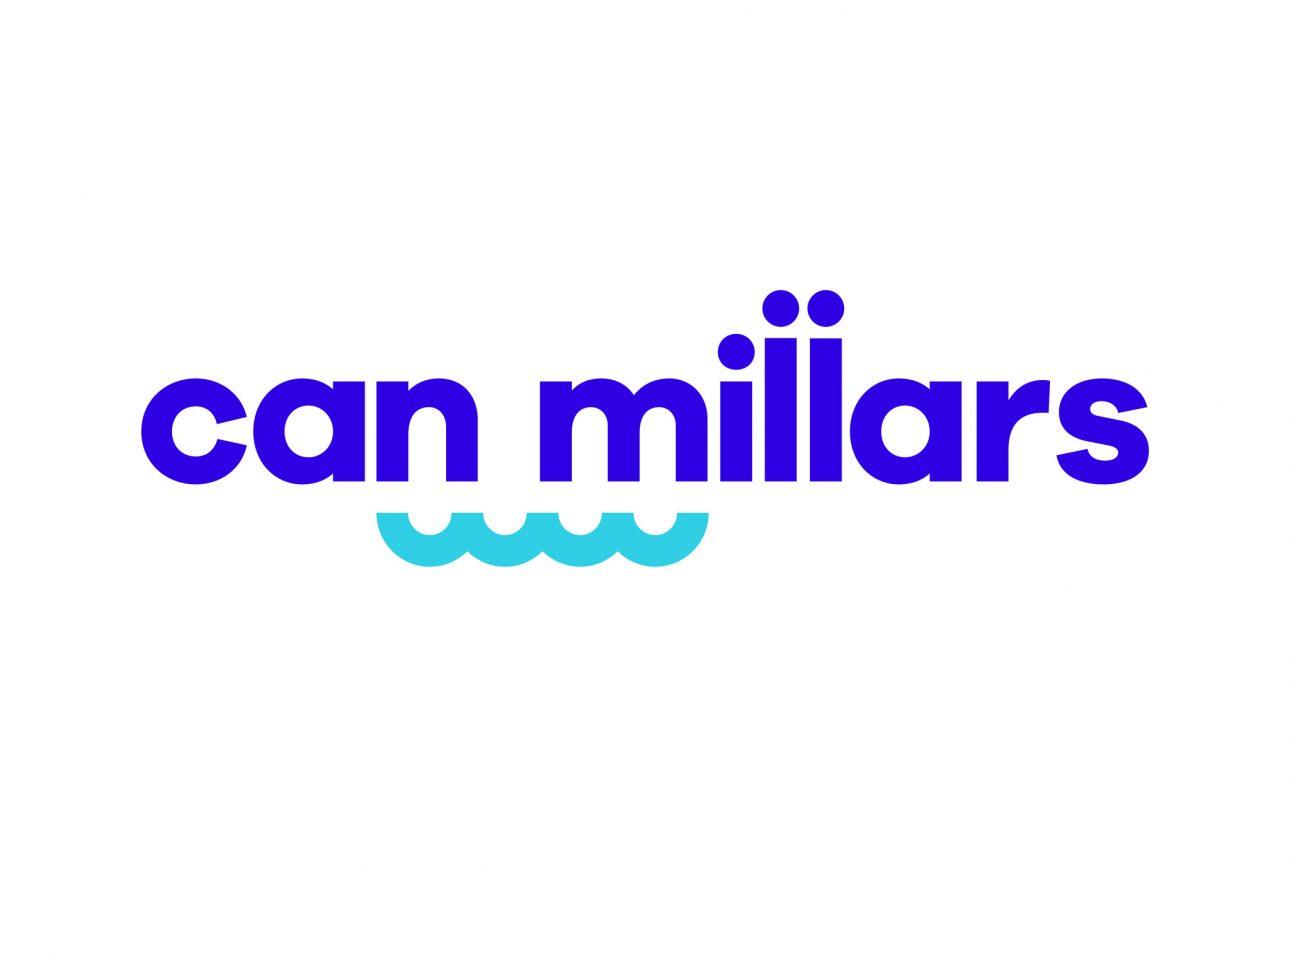 SD_CAN-MILLARS_04